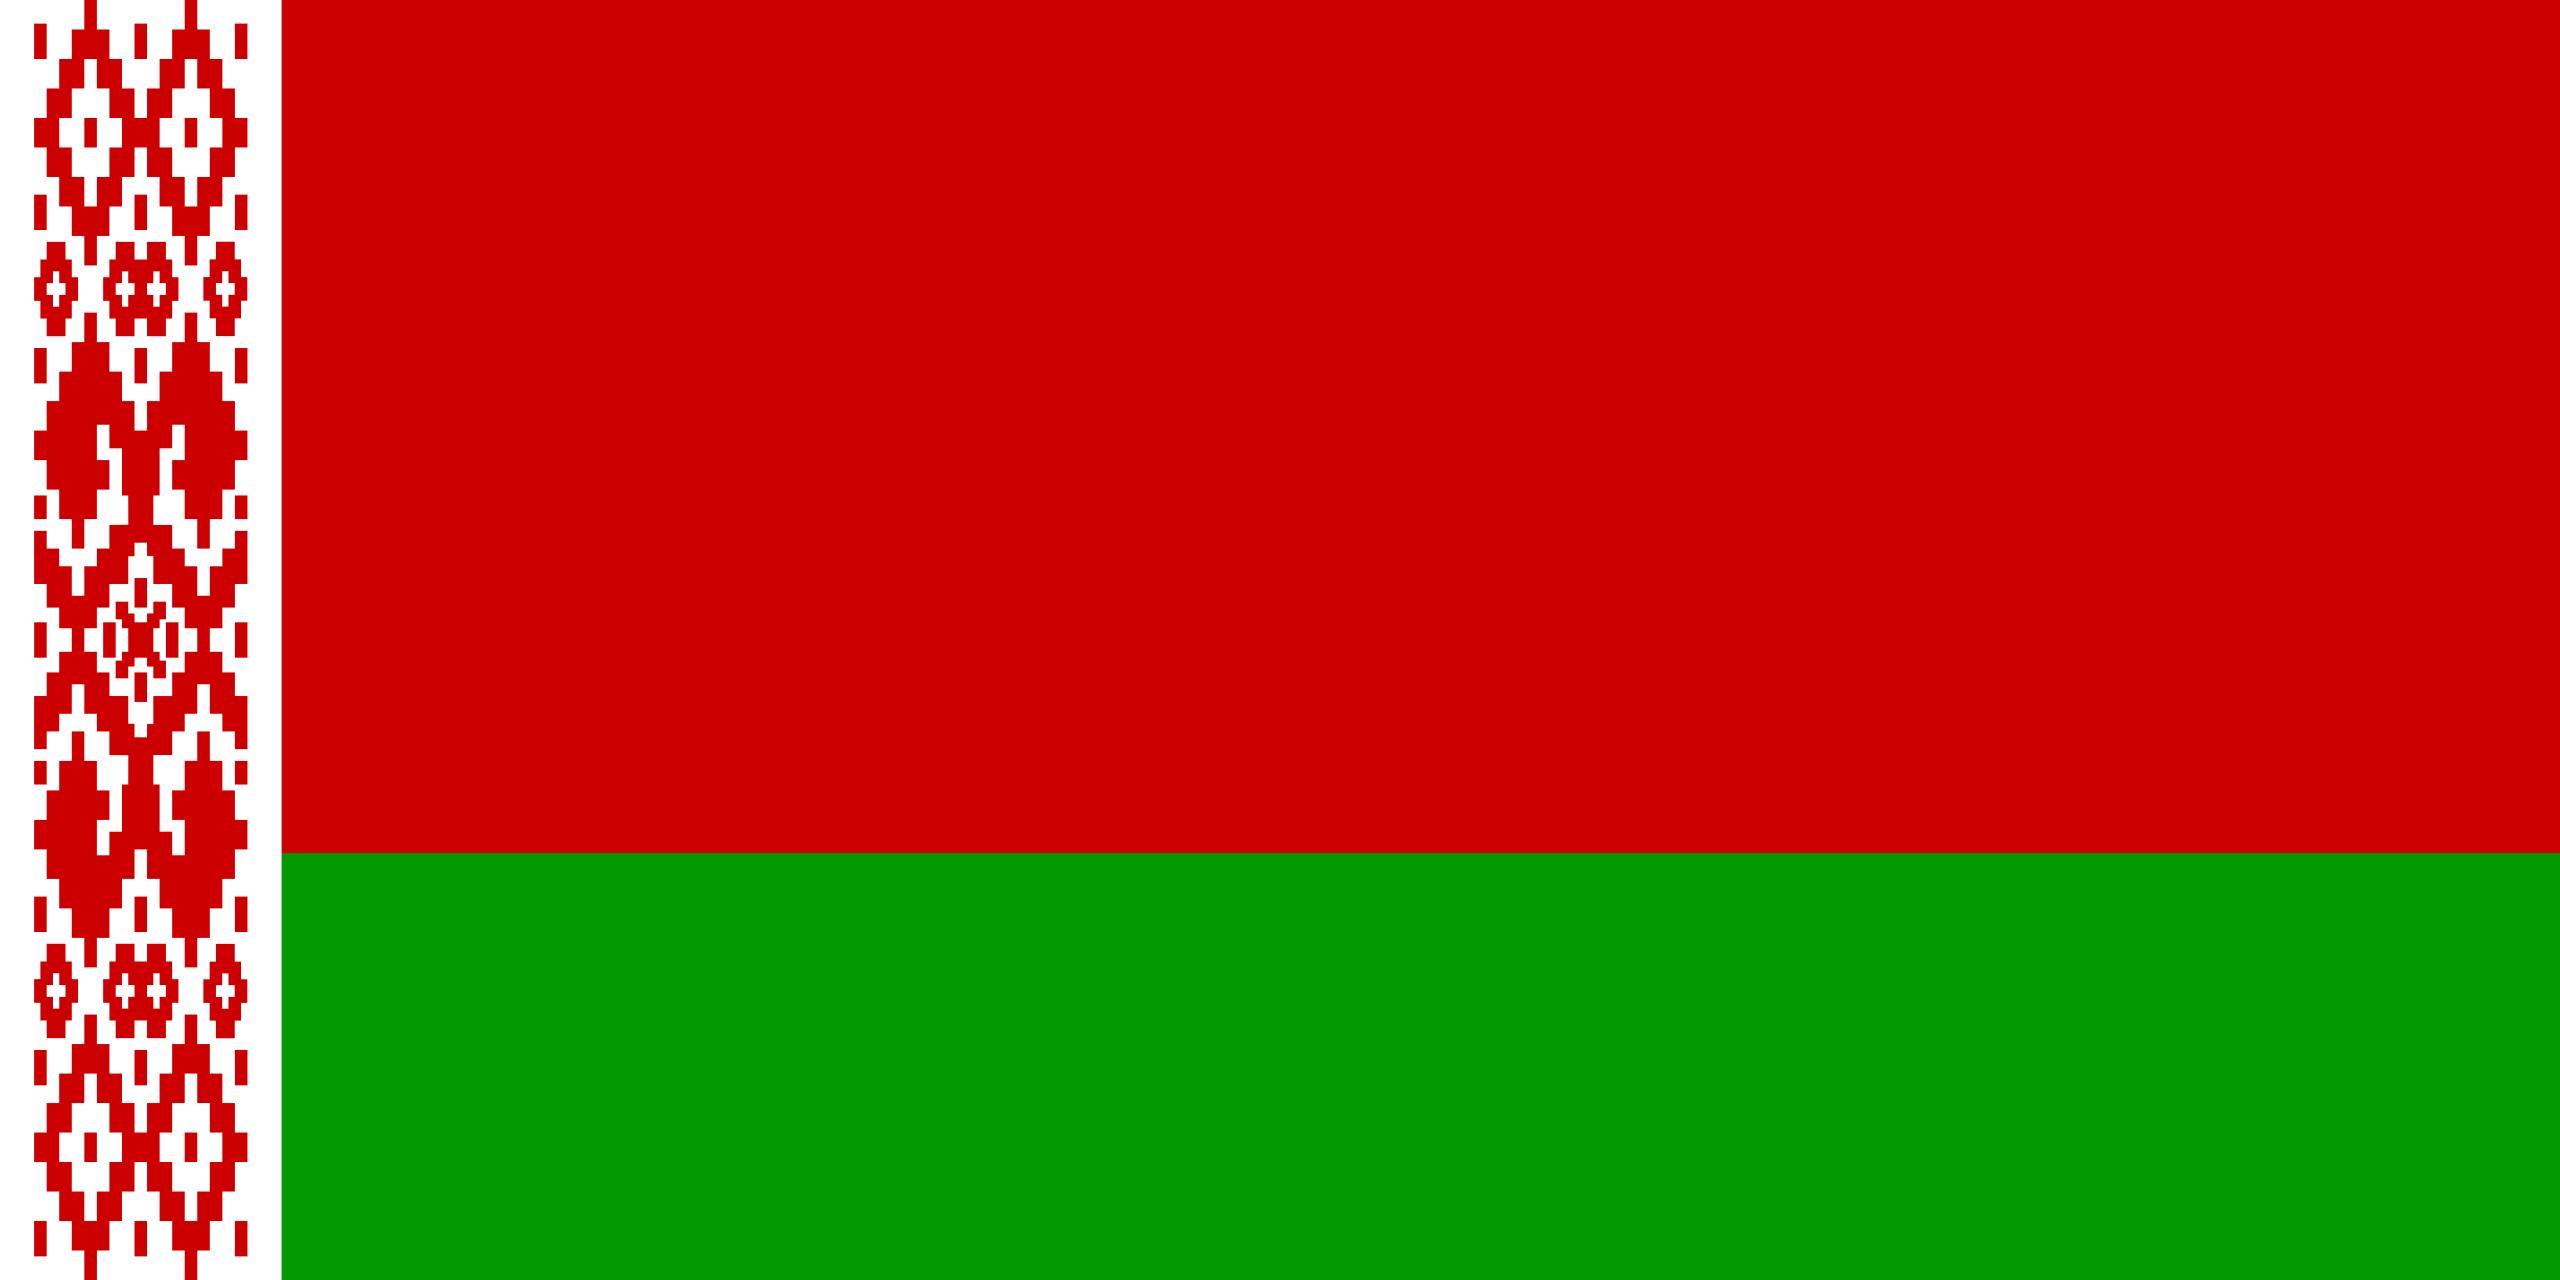 Belarus, paese, emblema, logo, simbolo - Sfondi HD - Professor-falken.com